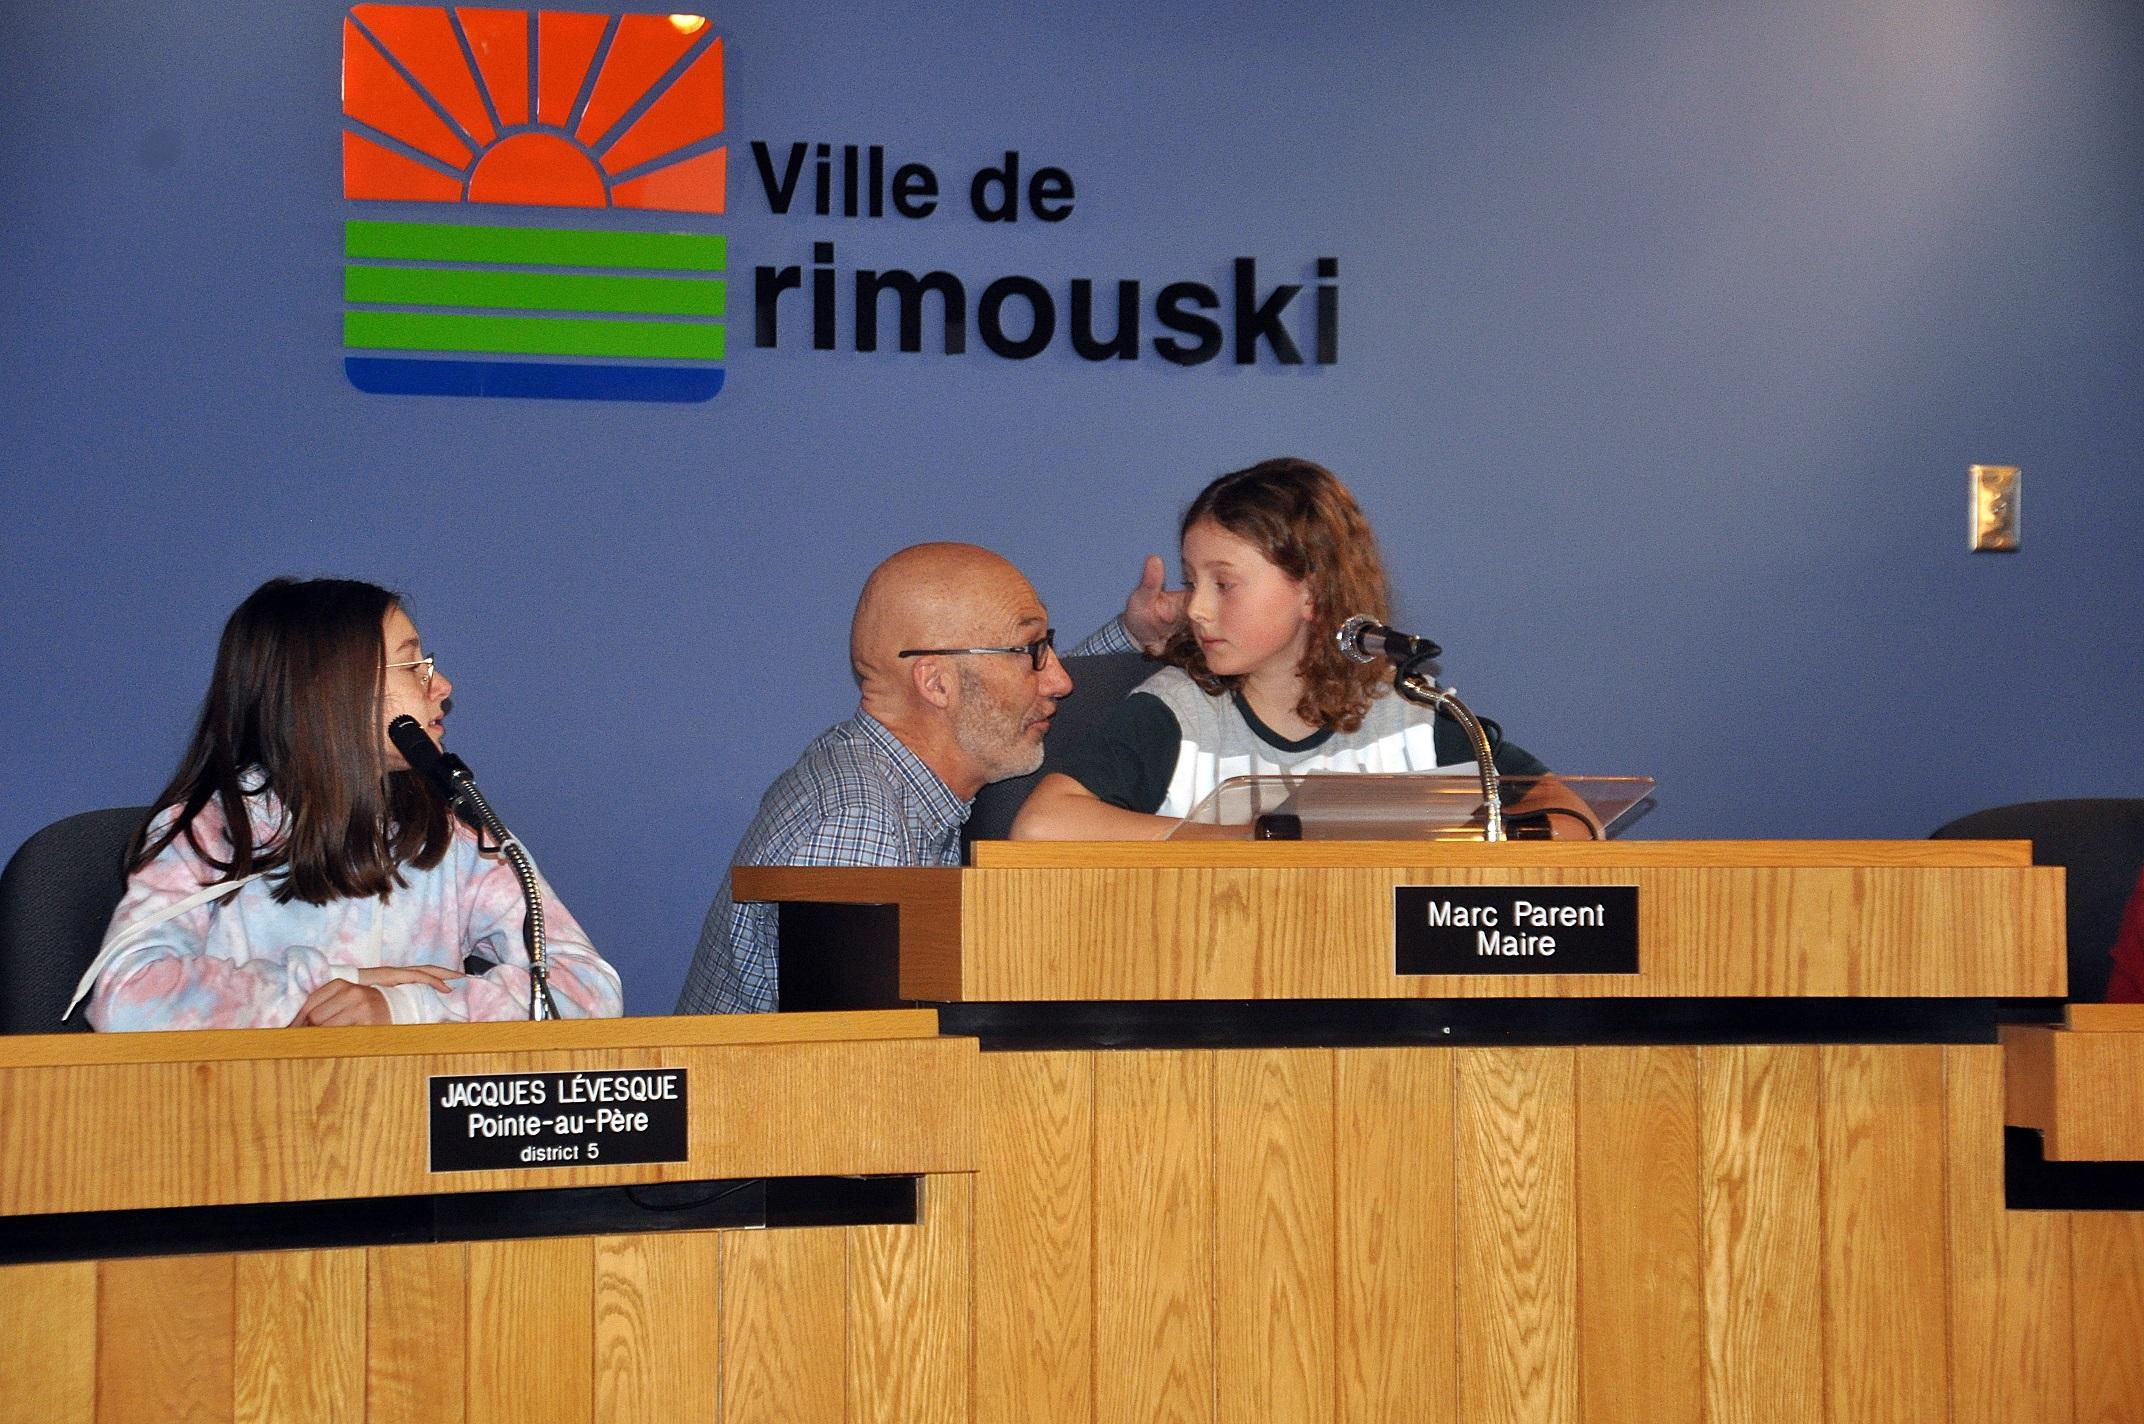 Conseil municipal d'un jour